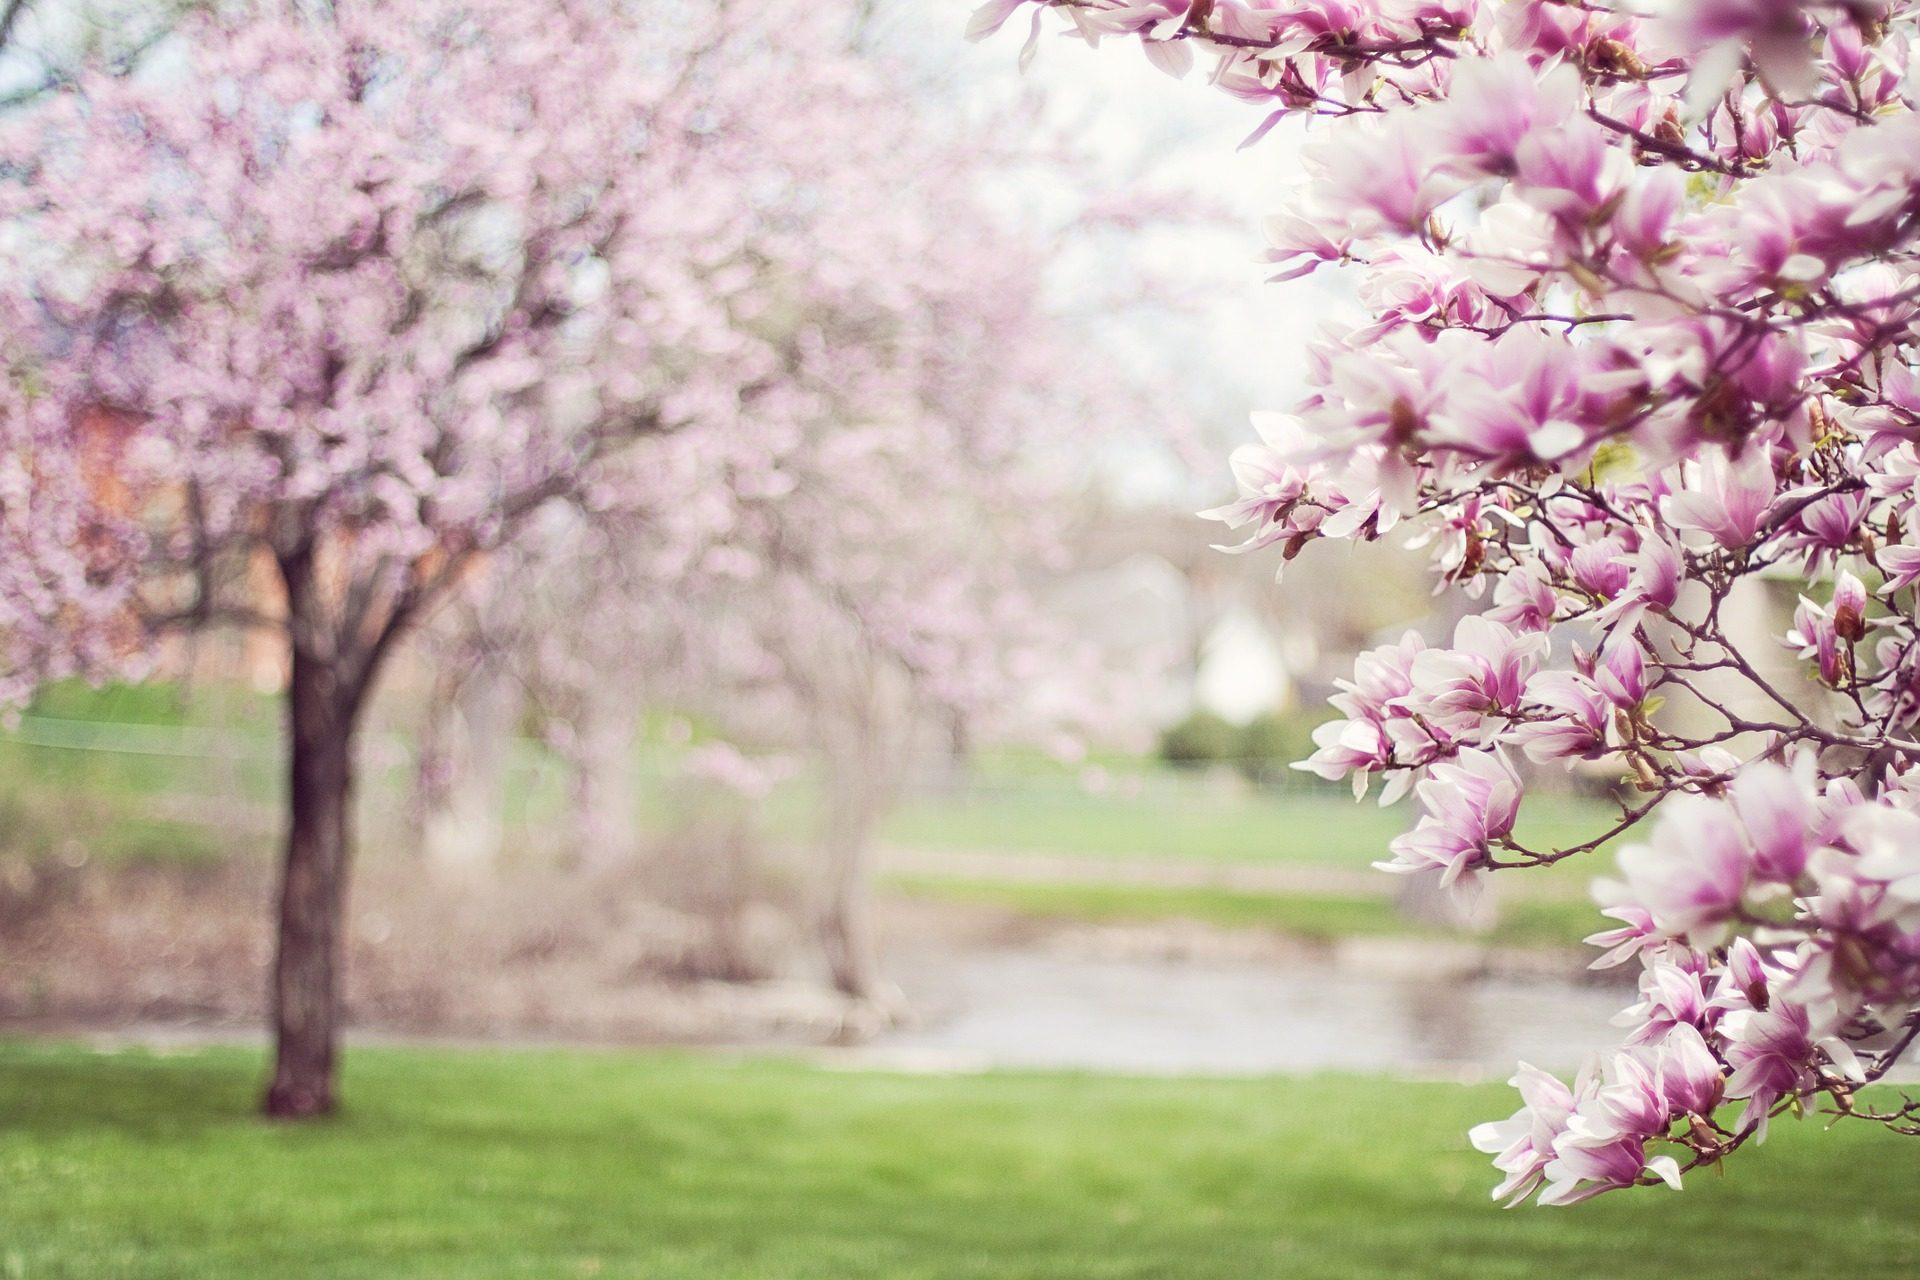 árvores, Flor, magnólias, Primavera, Rosa - Papéis de parede HD - Professor-falken.com